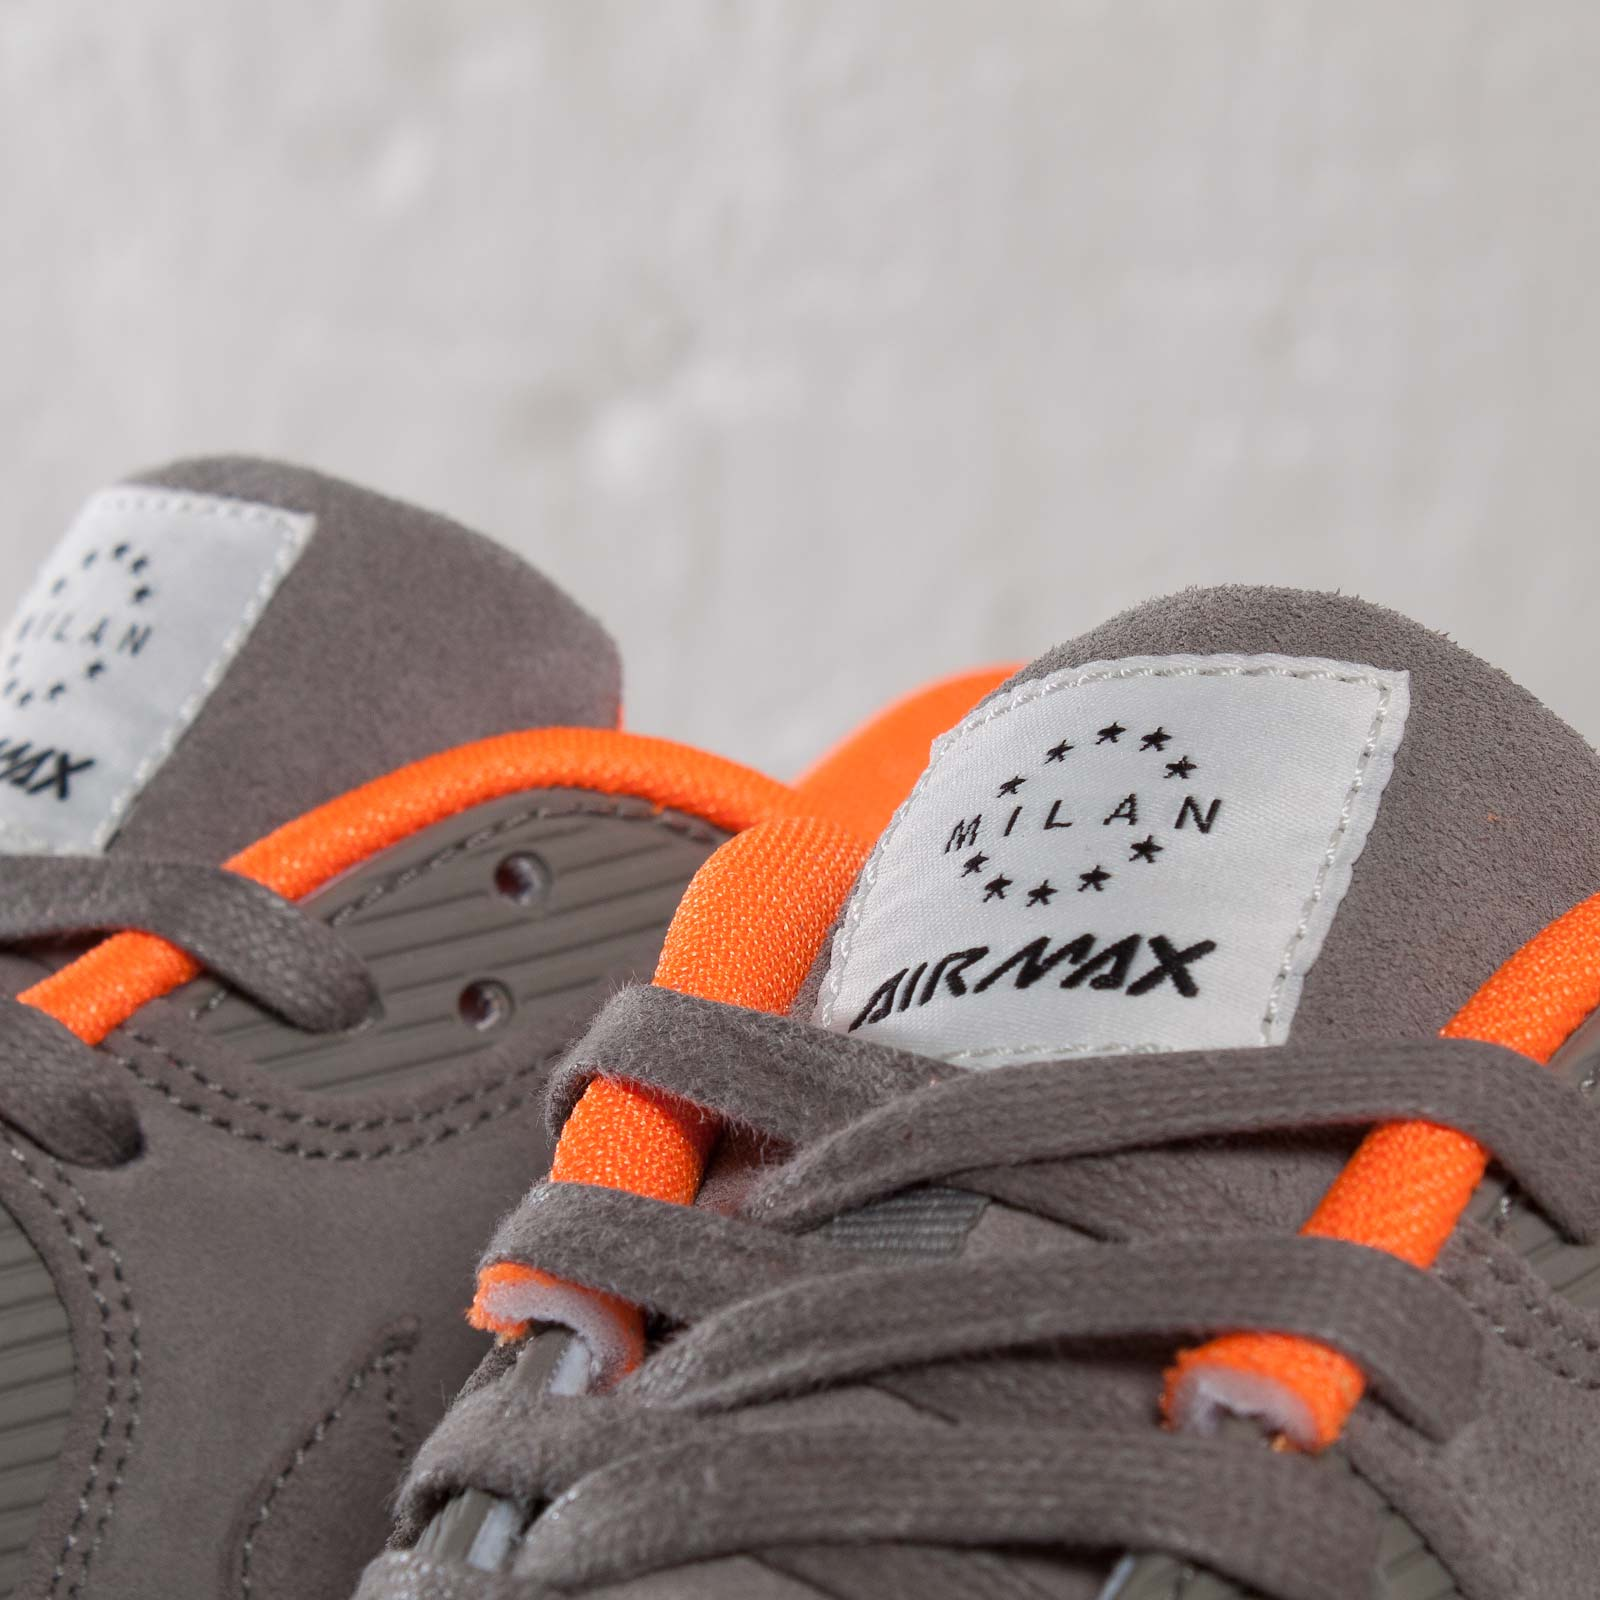 Nike Air Max 90 Milano QS 586848 221 Sneakersnstuff I